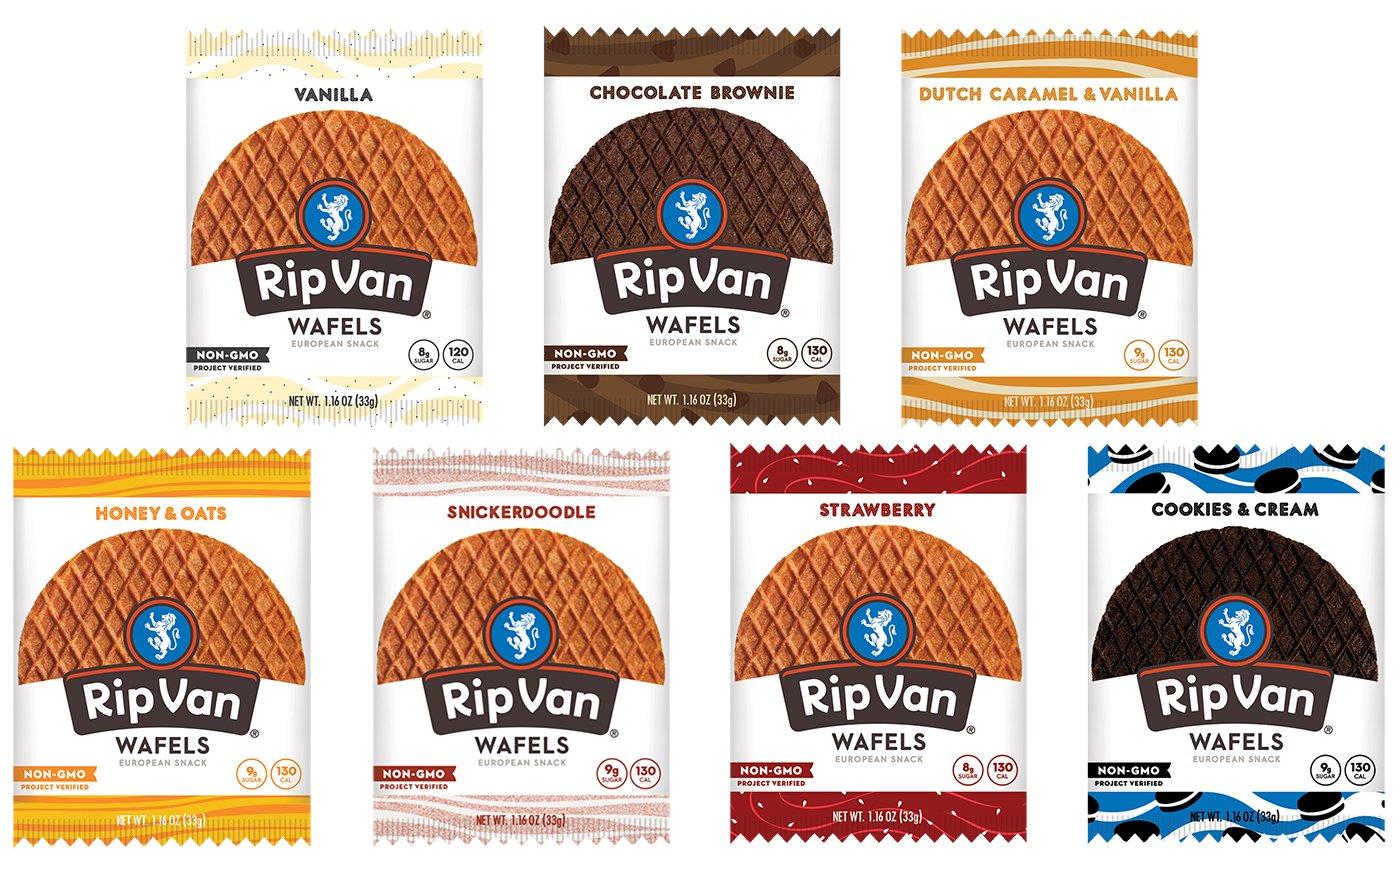 Rip Van Wafels 7 Flavor Variety Pack w/ Chocolate Brownie, Vanilla, Honey & Oats, Dutch Caramel & Vanilla, Snickerdoodle, Strawberry, Cookies & Cream (14 Pack)